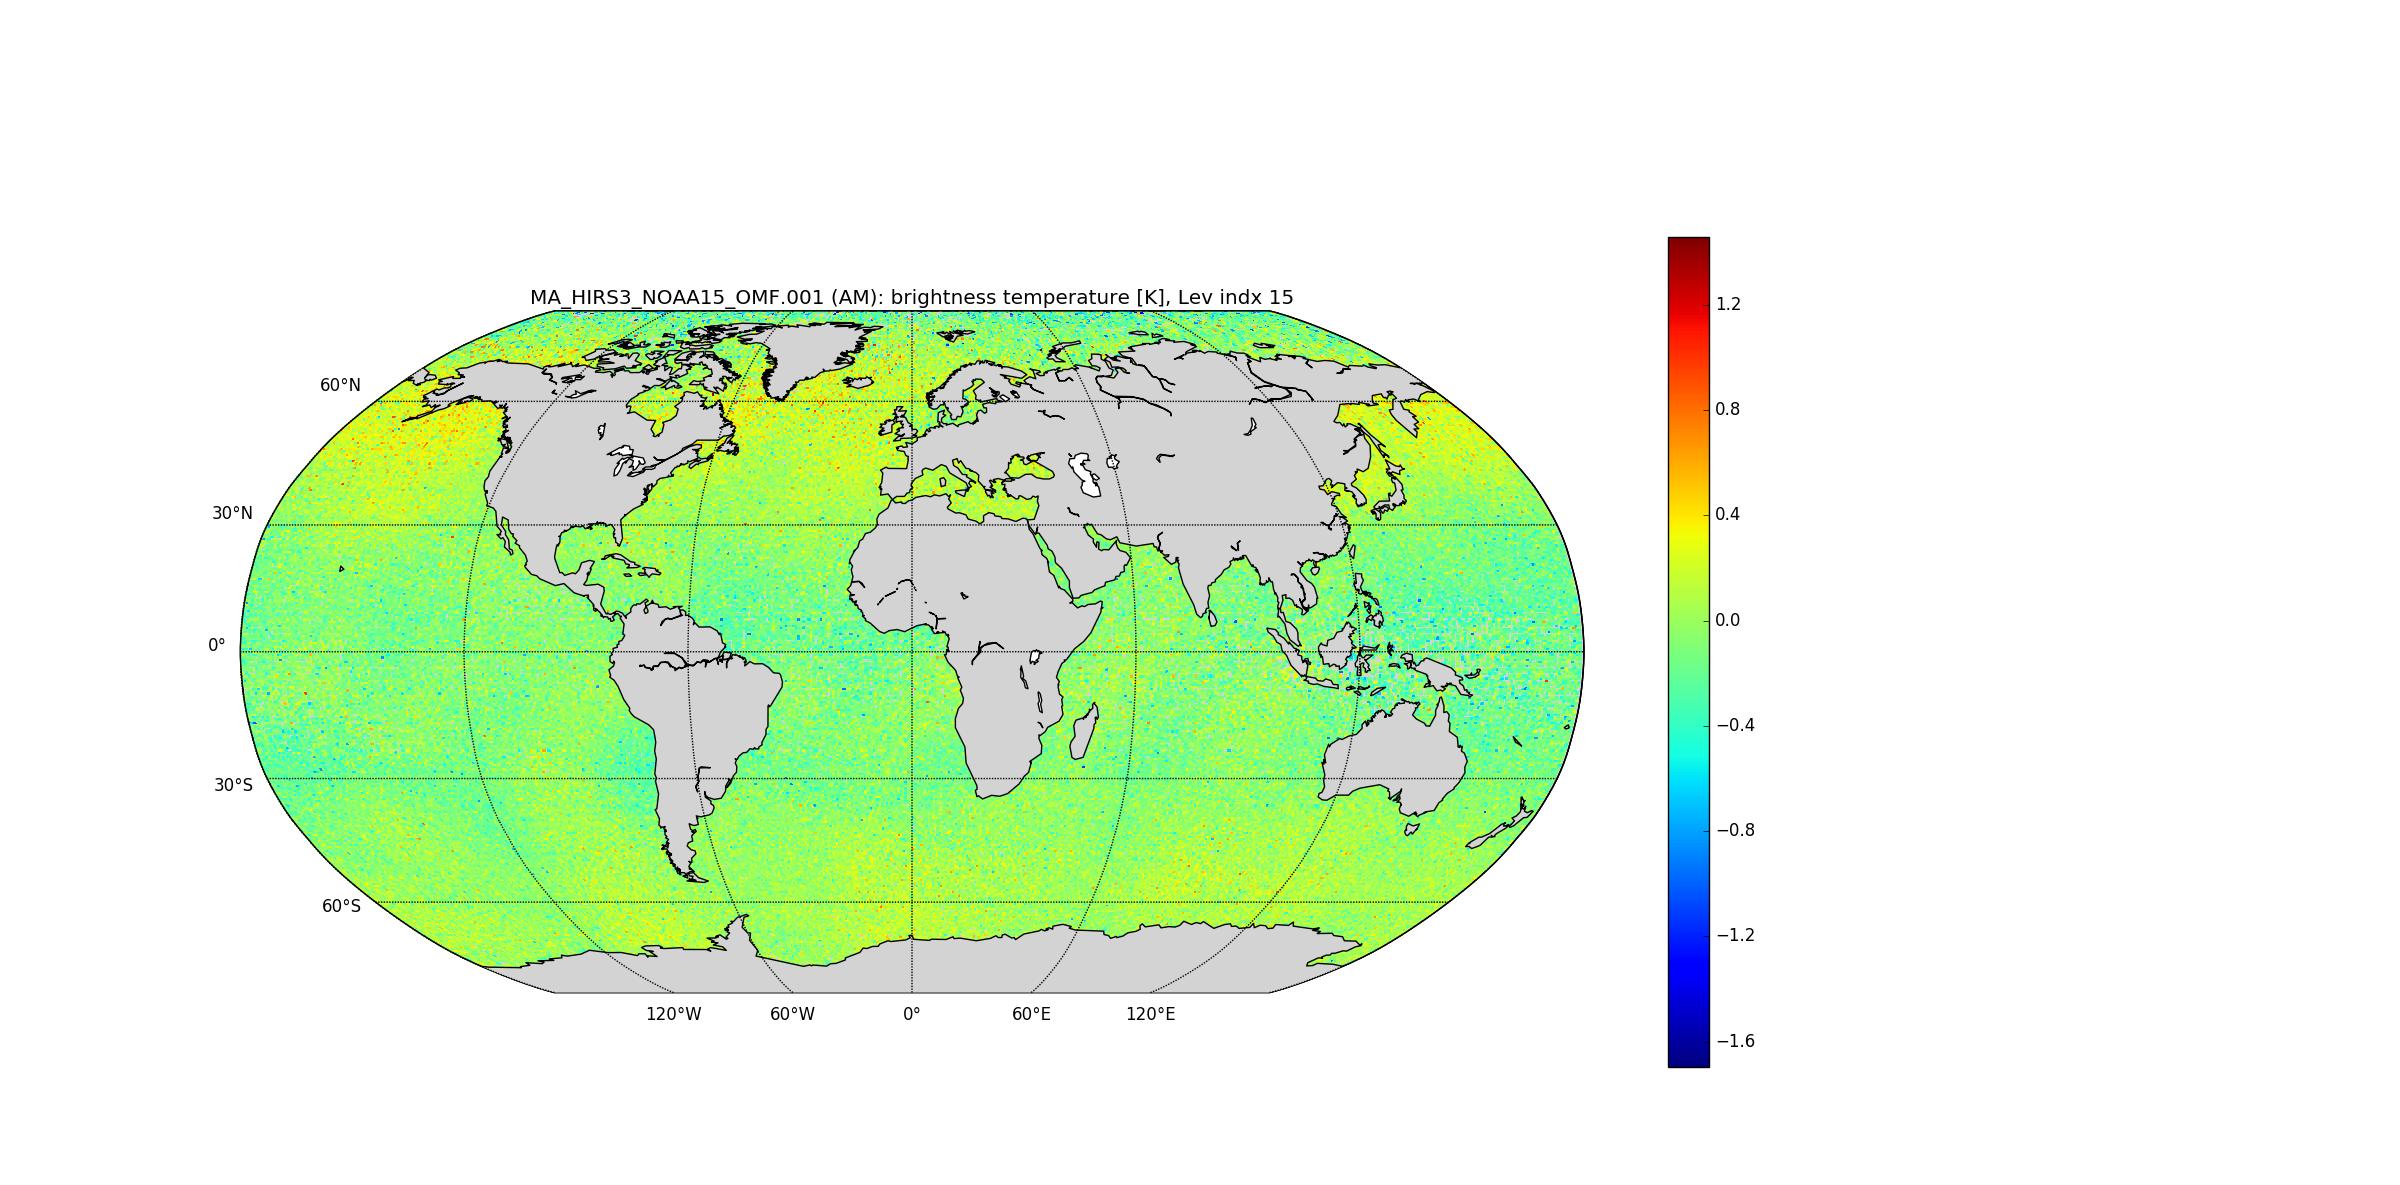 MA_HIRS3_NOAA15_OMF variable